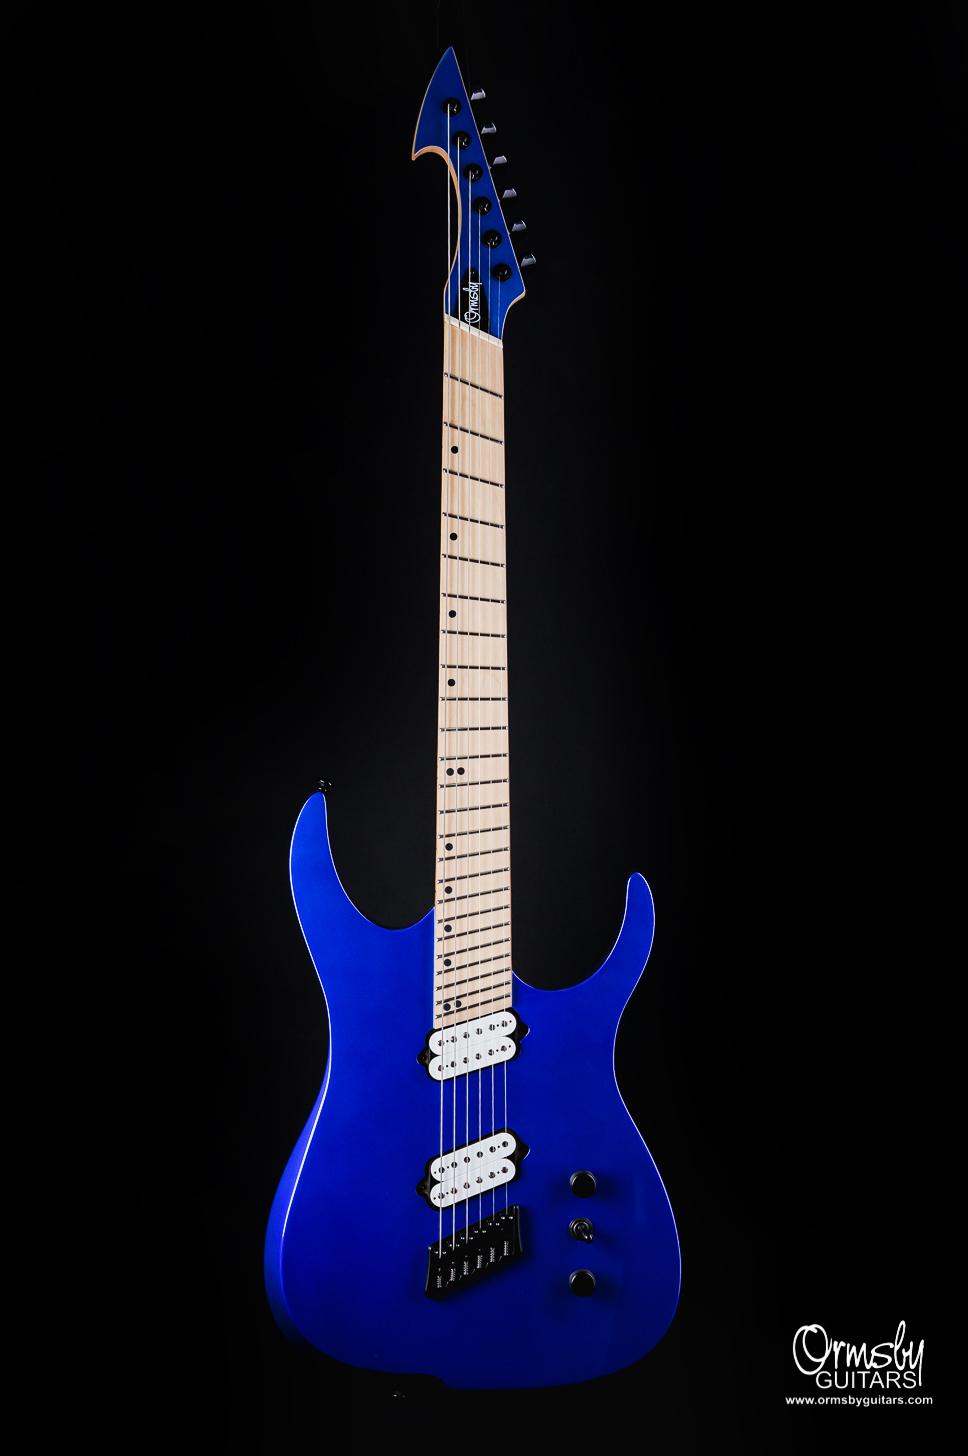 Ormsby Guitars Run 5 Hype